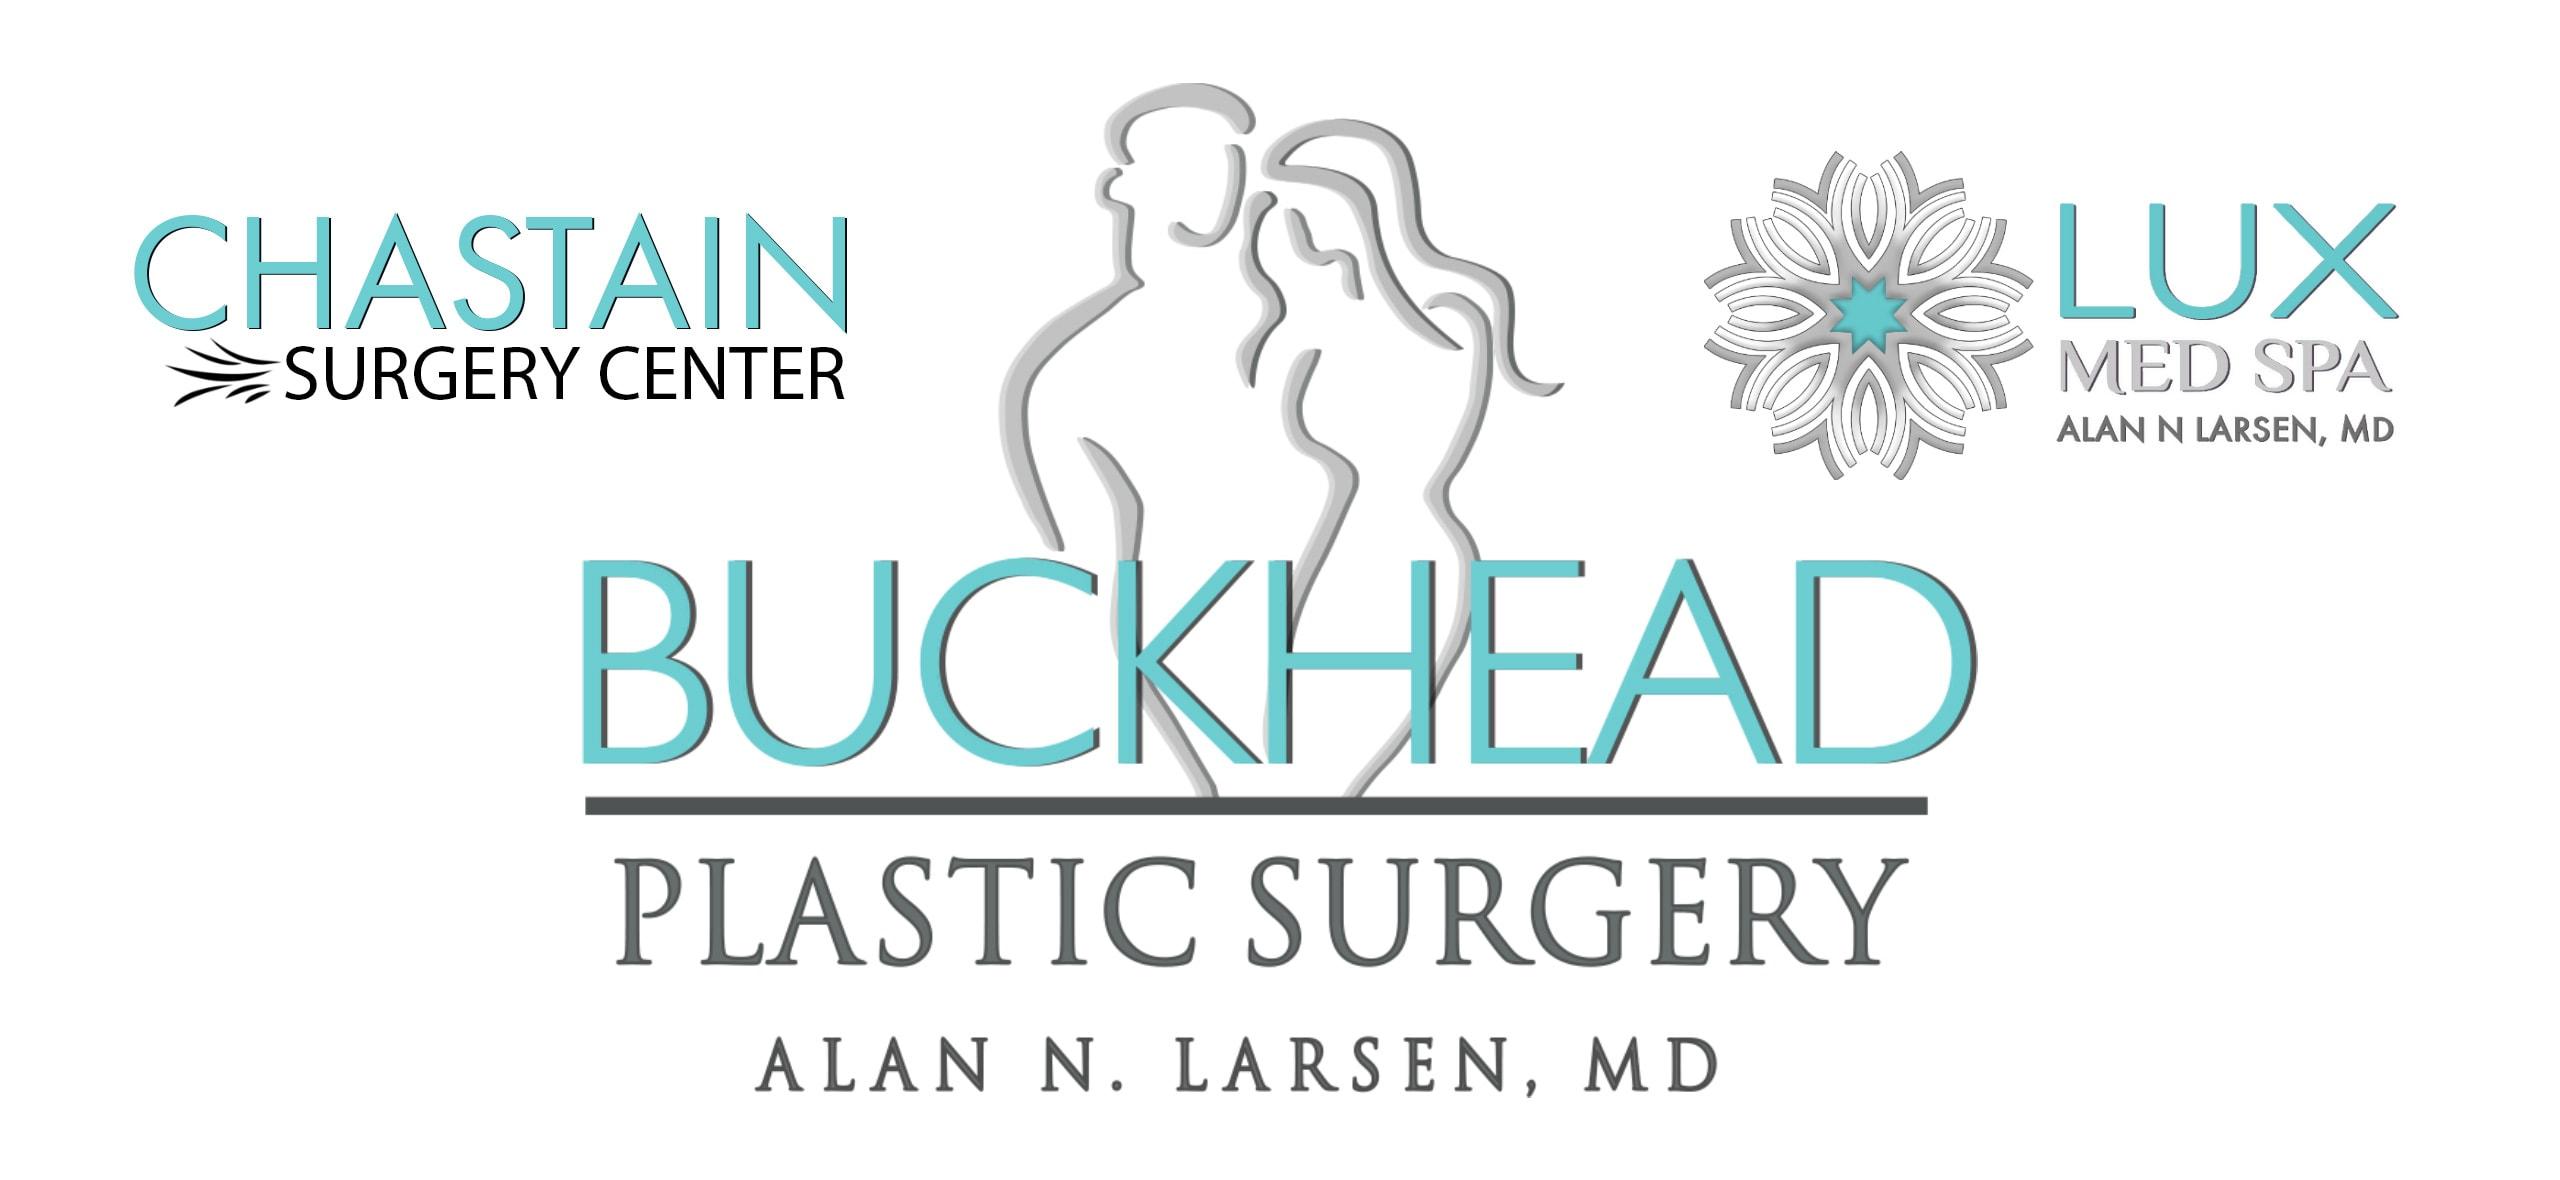 chastain surgery center buckhead atlanta, GA buckhead plastic surgery lux med spa alan n larsen md